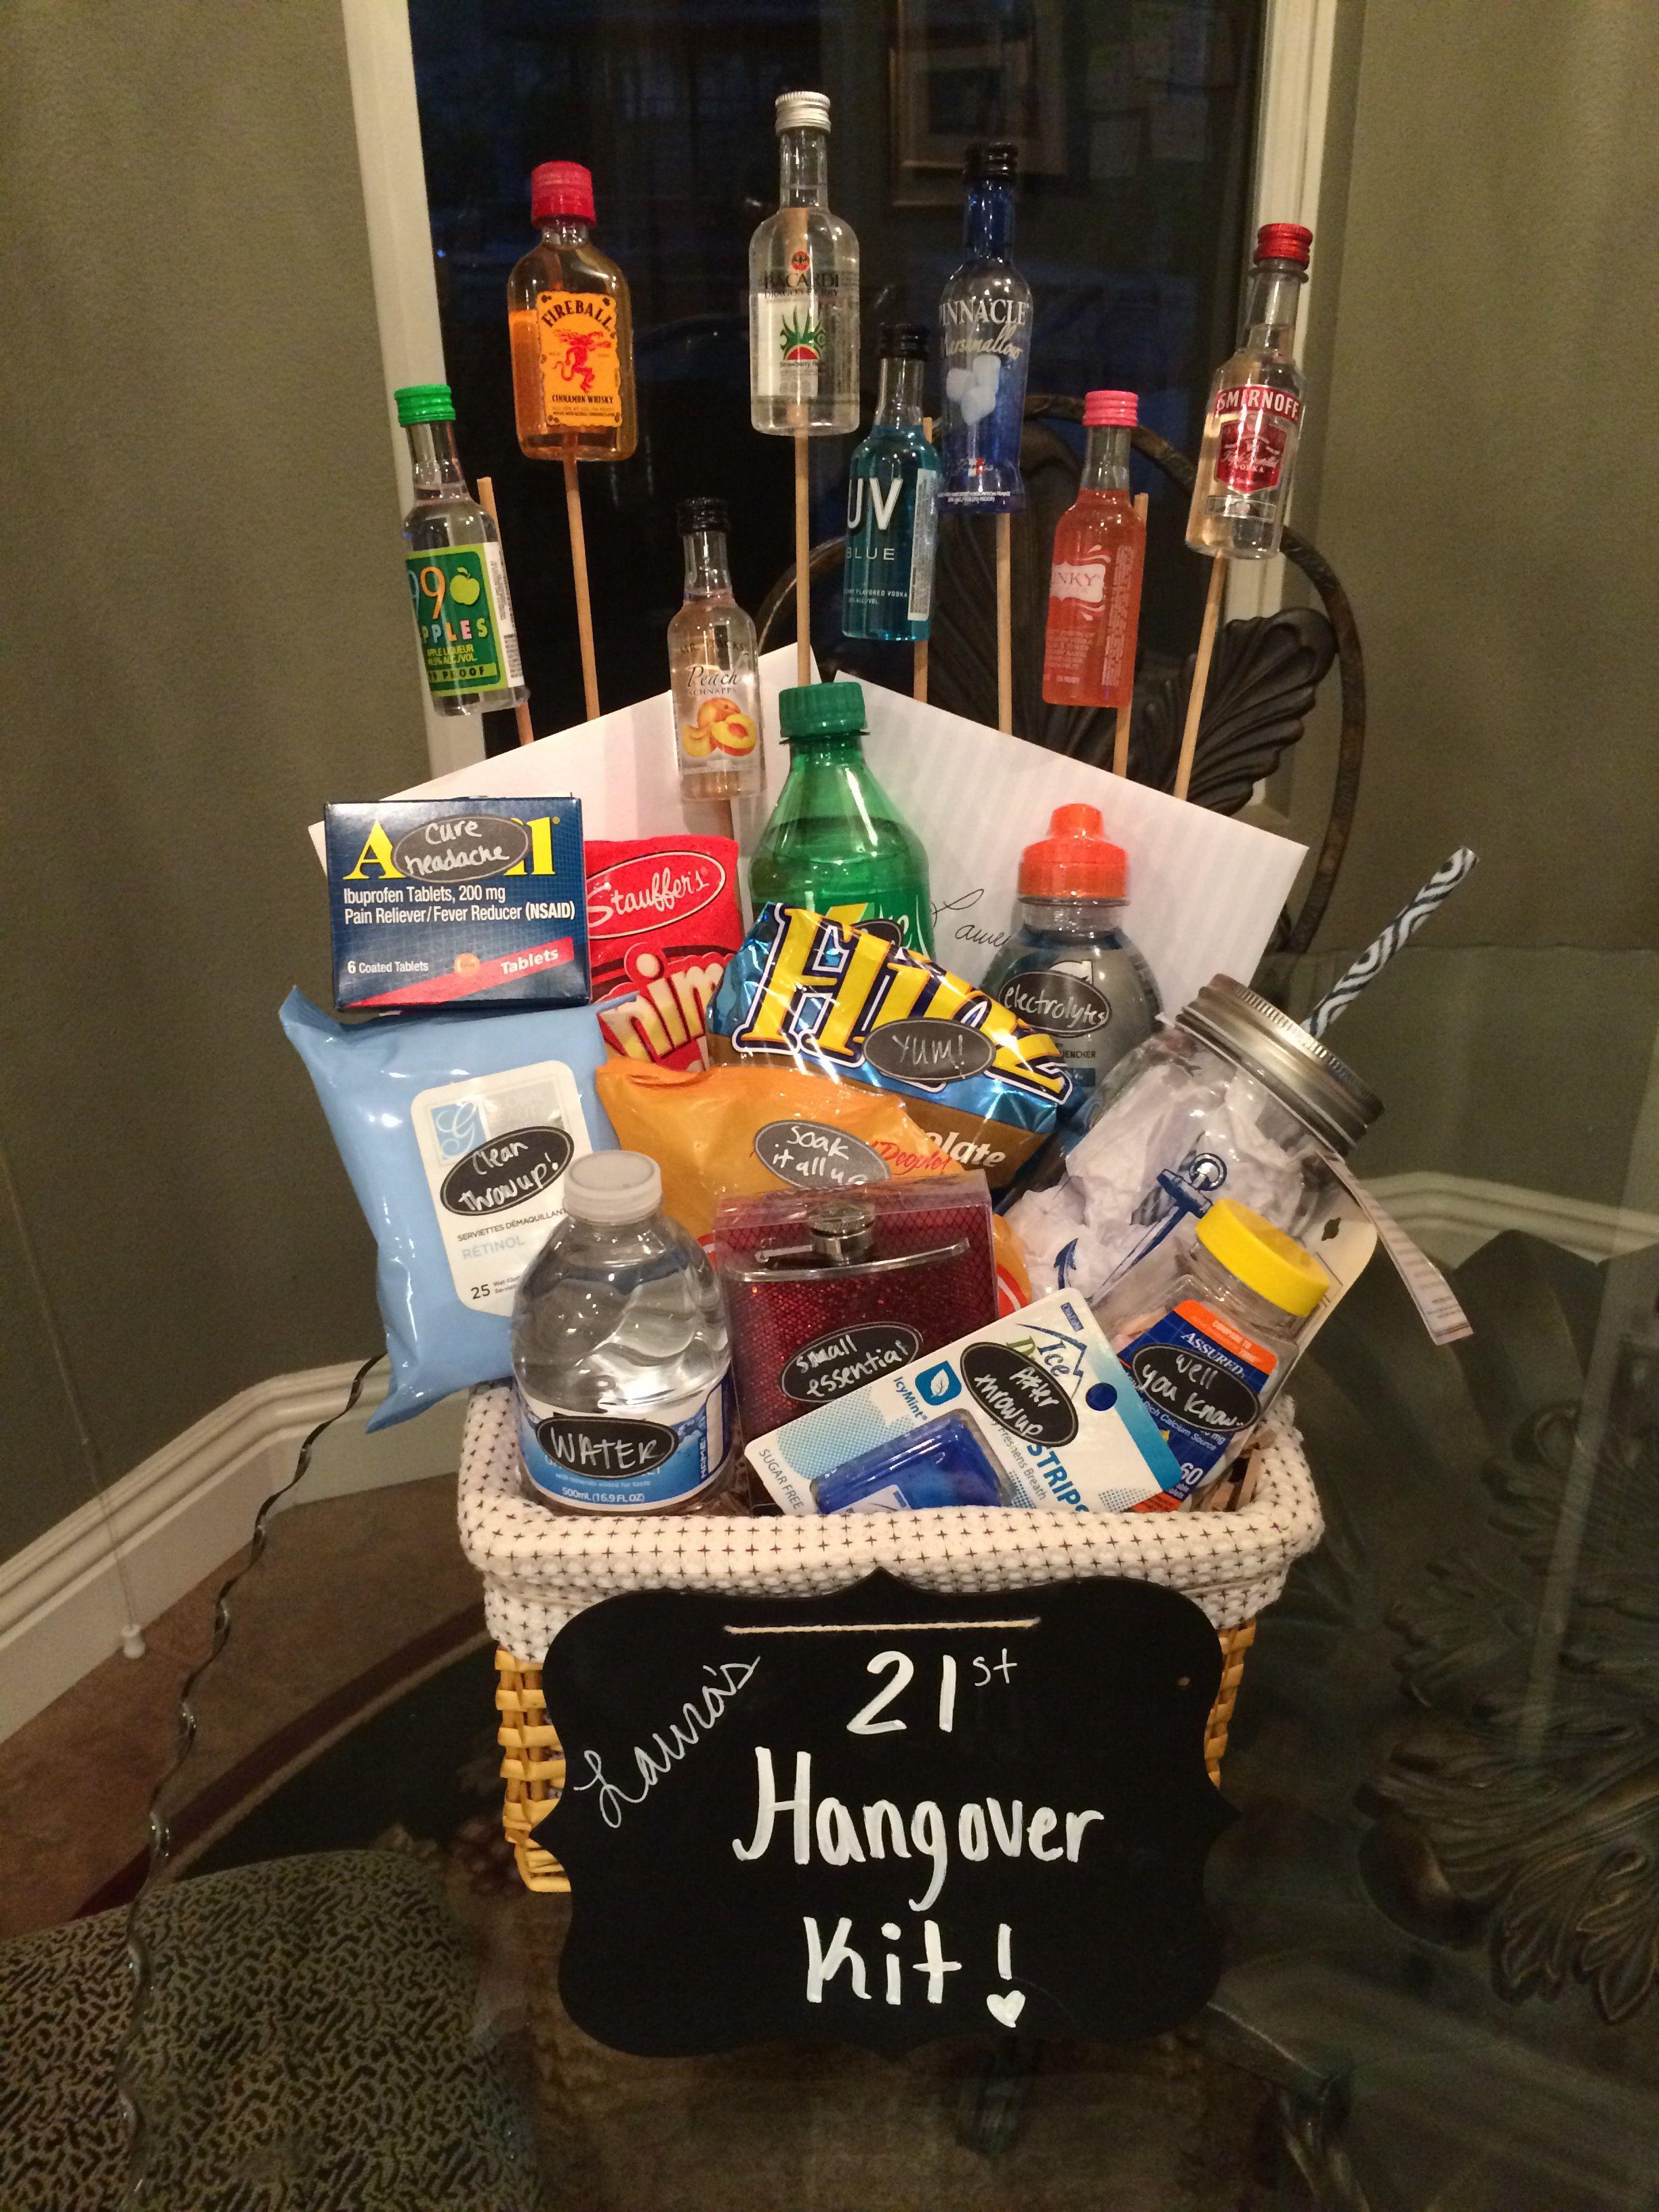 21st Birthday Hangover Kit Hangover Kit Includes Water Gatorade Electrolytes Snacks Pr